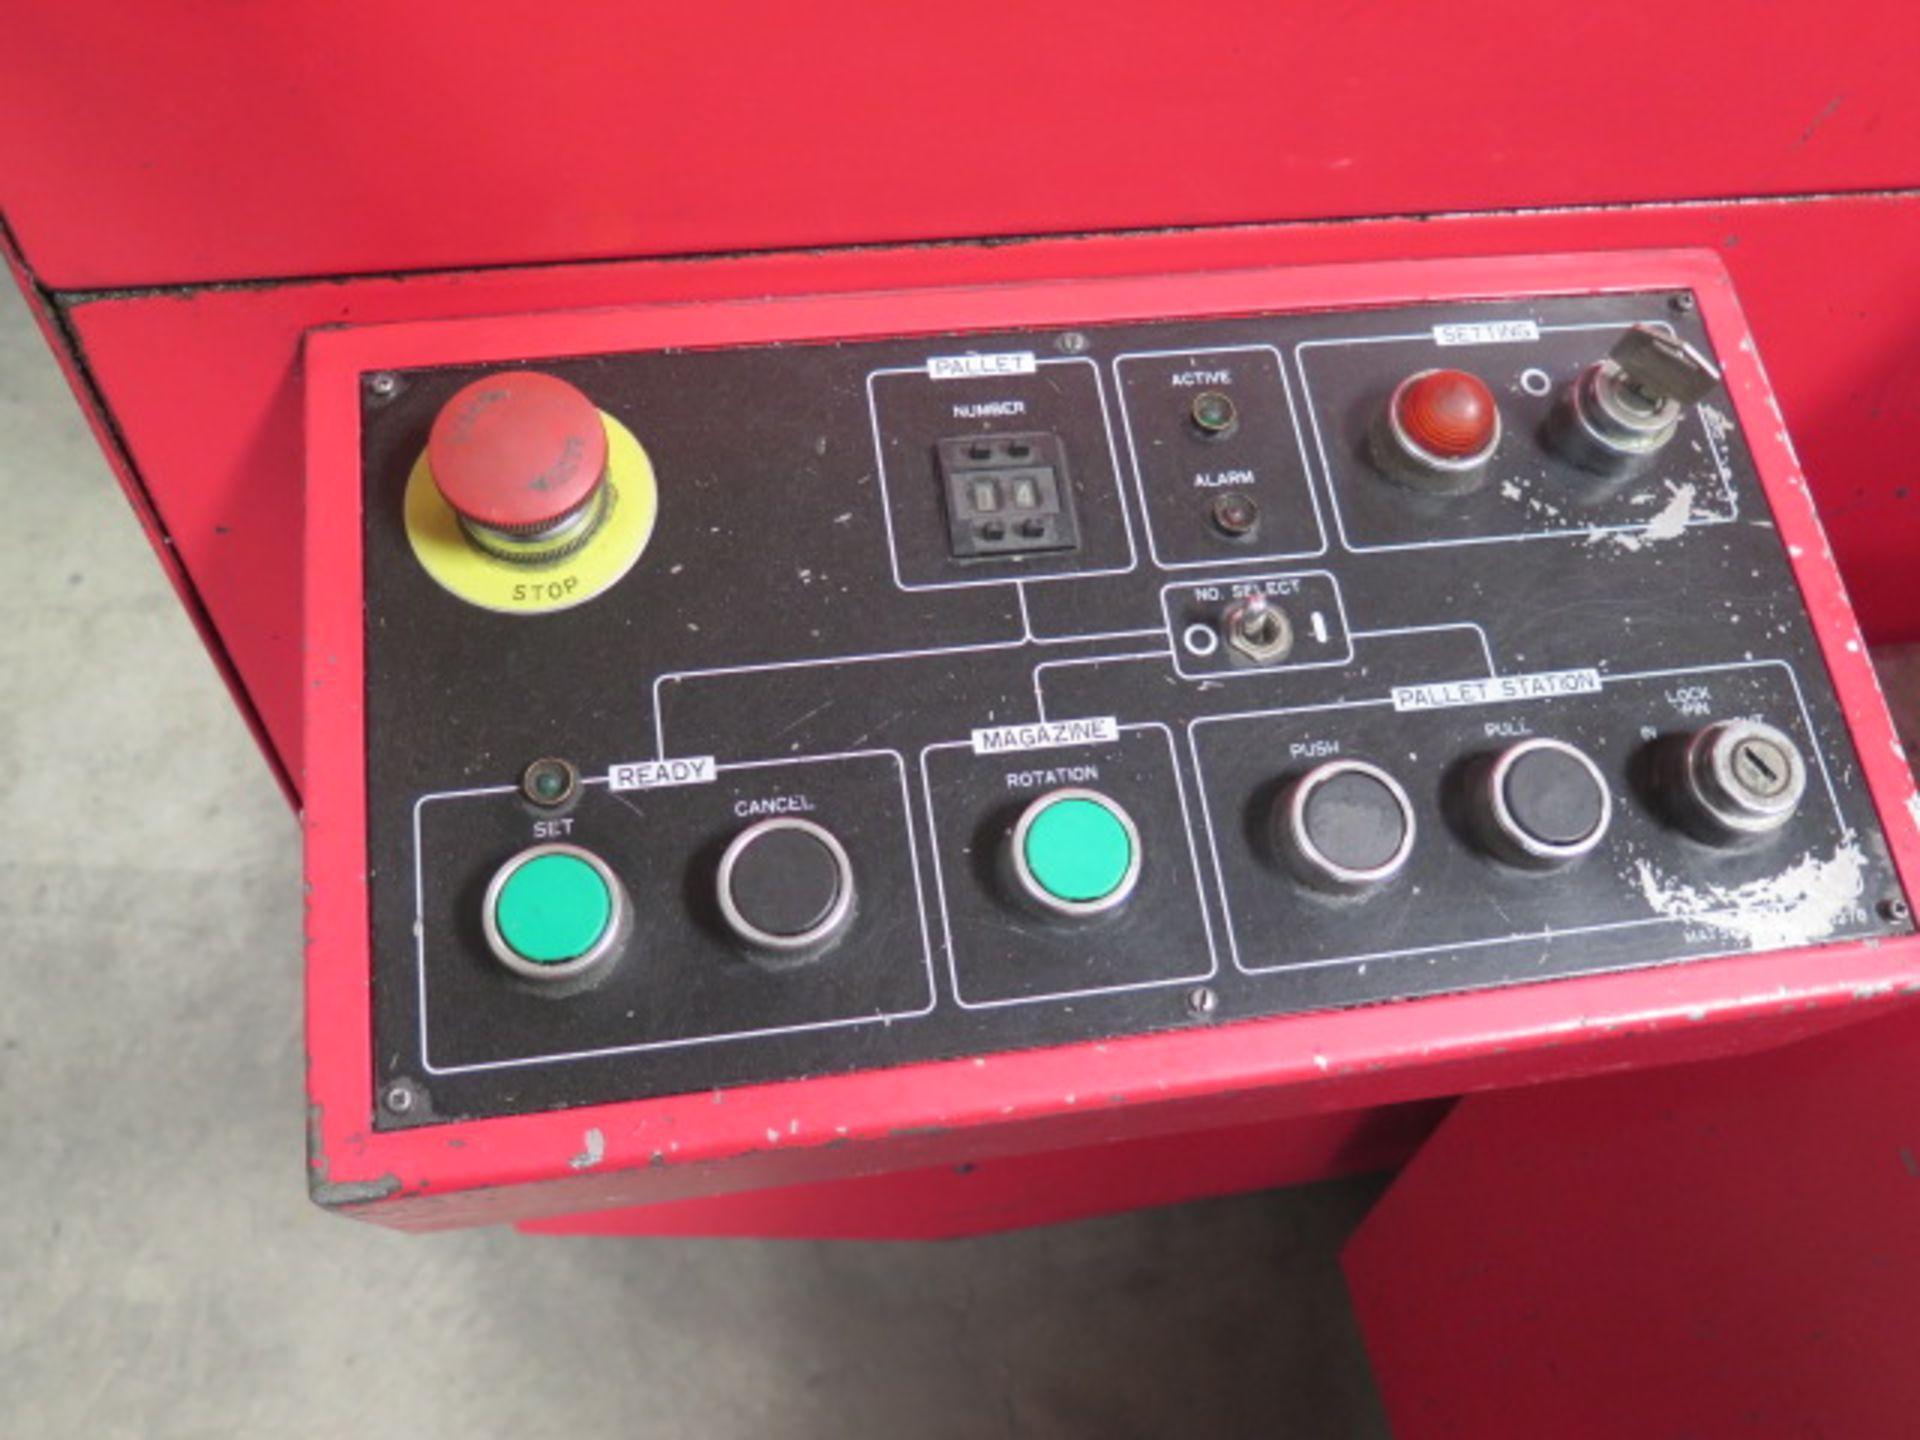 1992 Matsuura MC-450H-30-PC II 10-Pallet CNC Horizontal Machining Center s/n 910609609, SOLD AS IS - Image 18 of 23